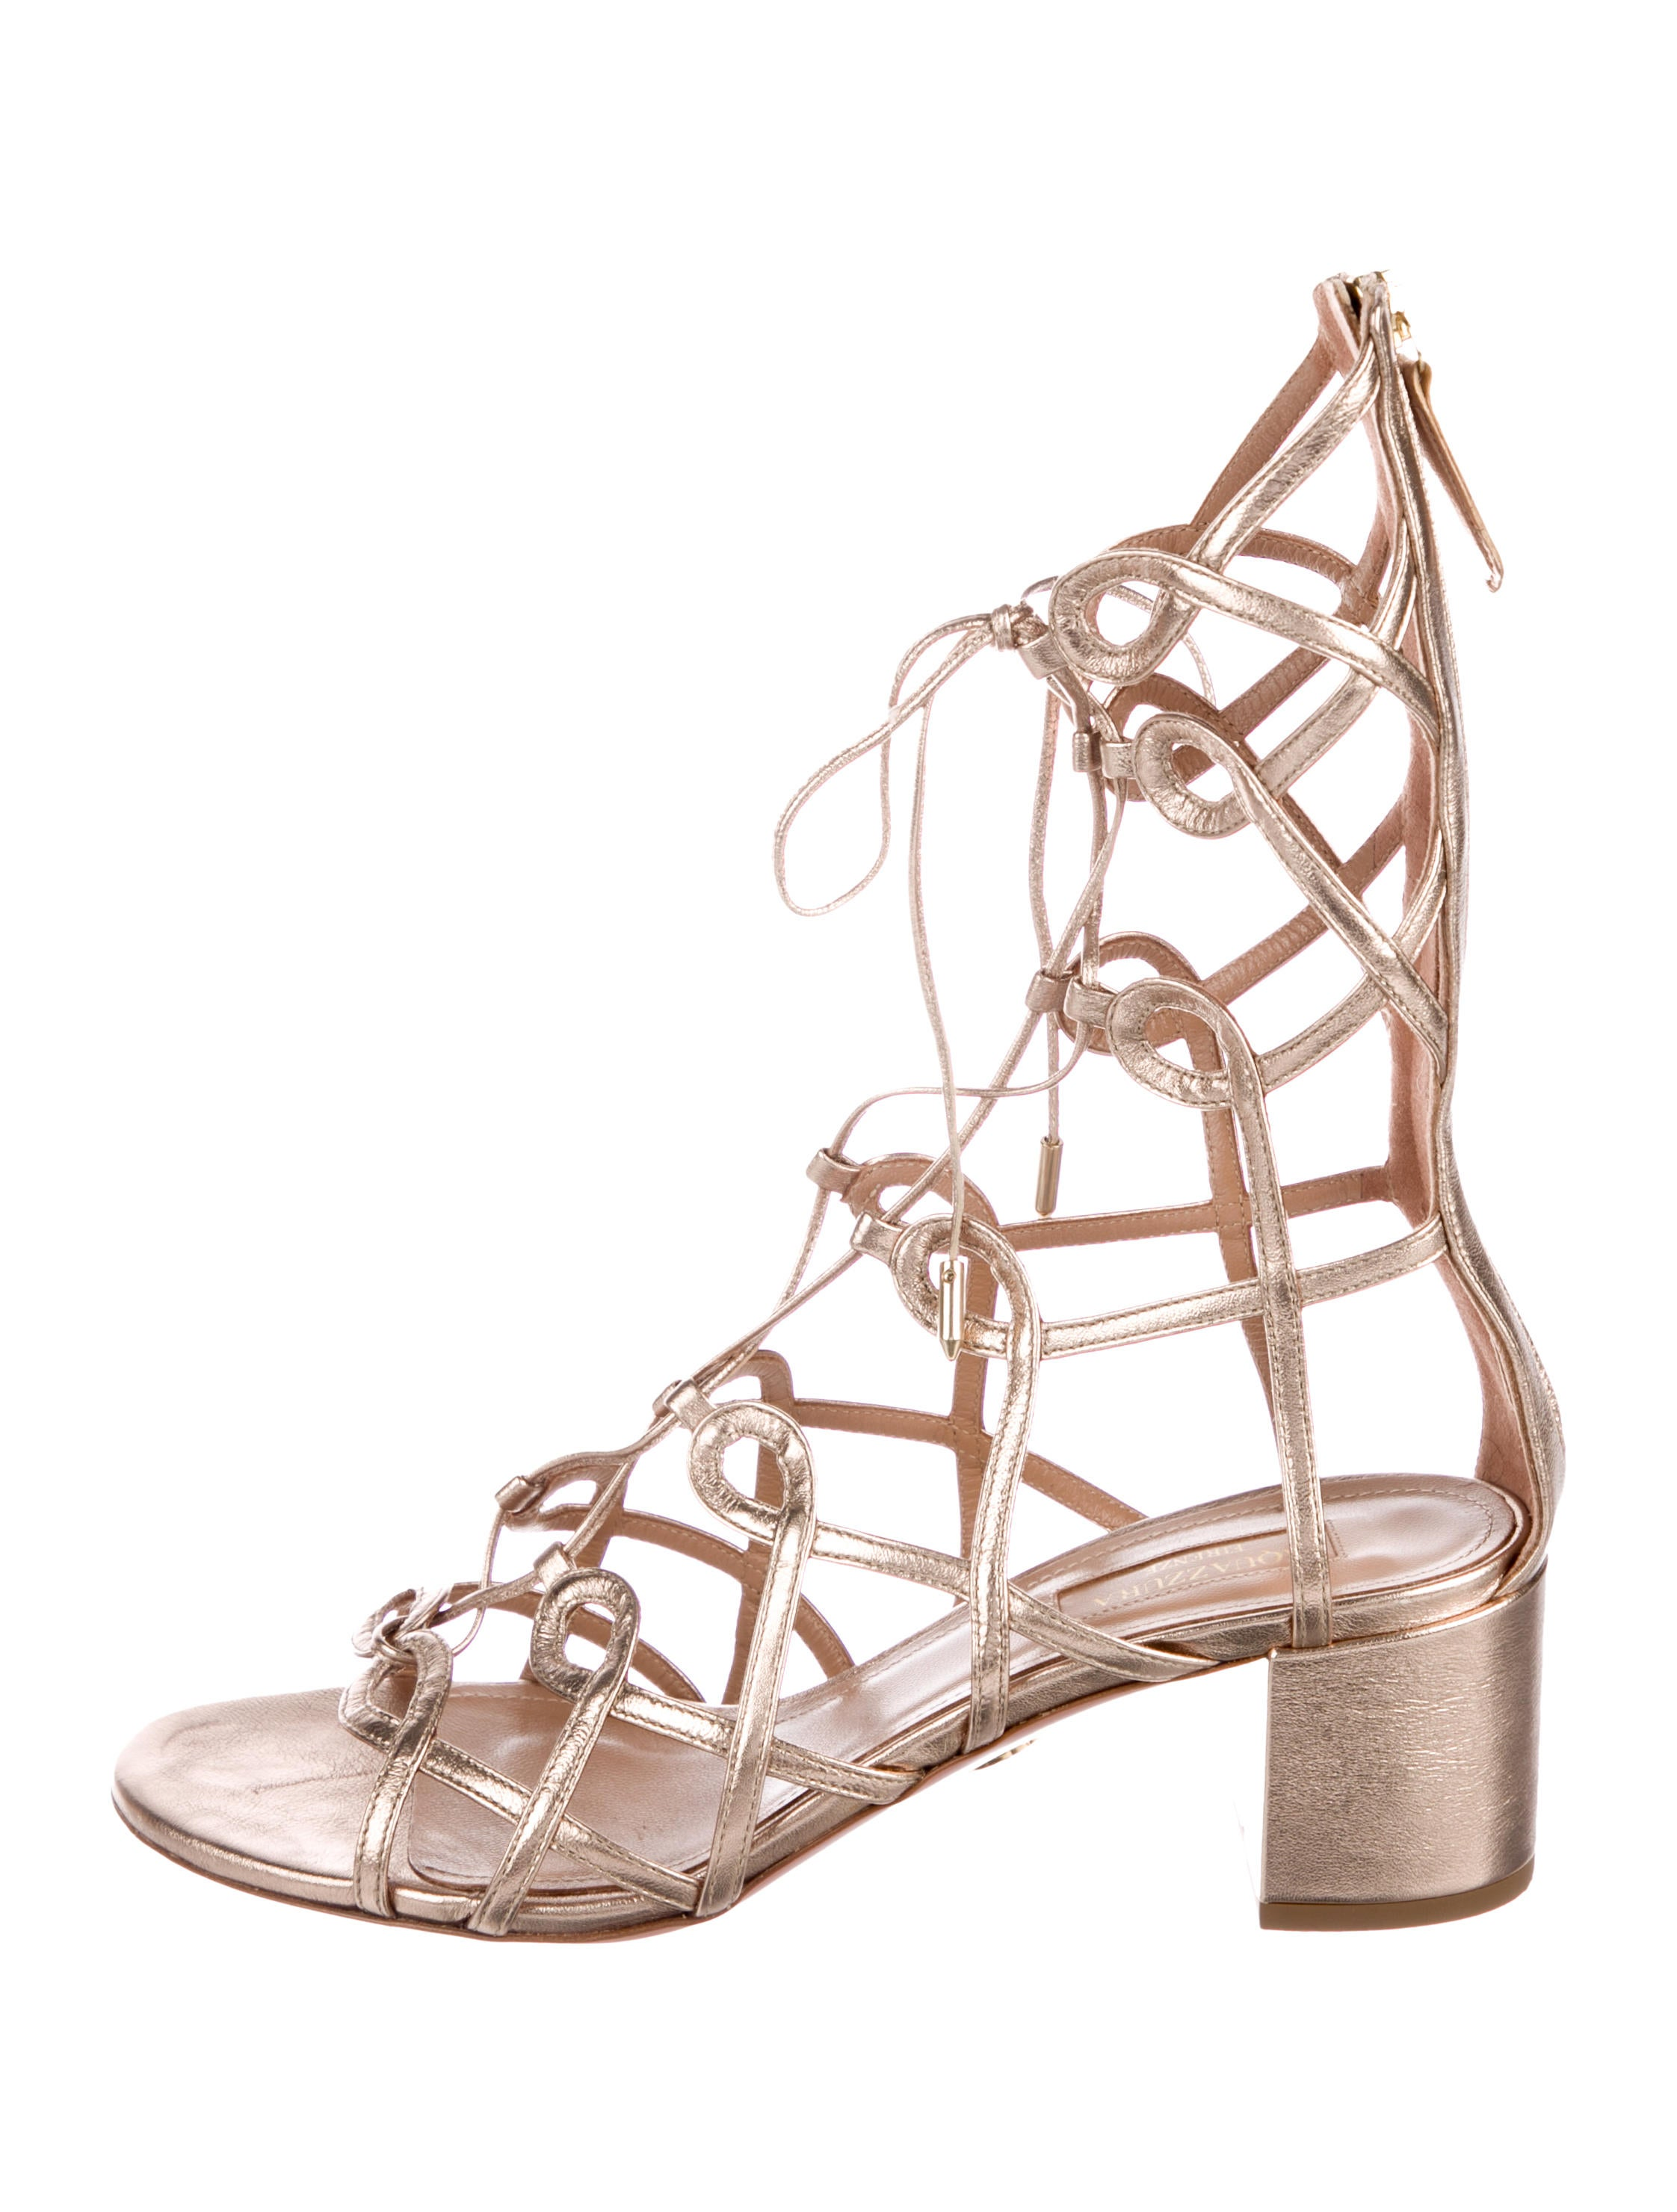 8069cc31370 Aquazzura Mumbai Gladiator Sandals - Shoes - AQZ27656